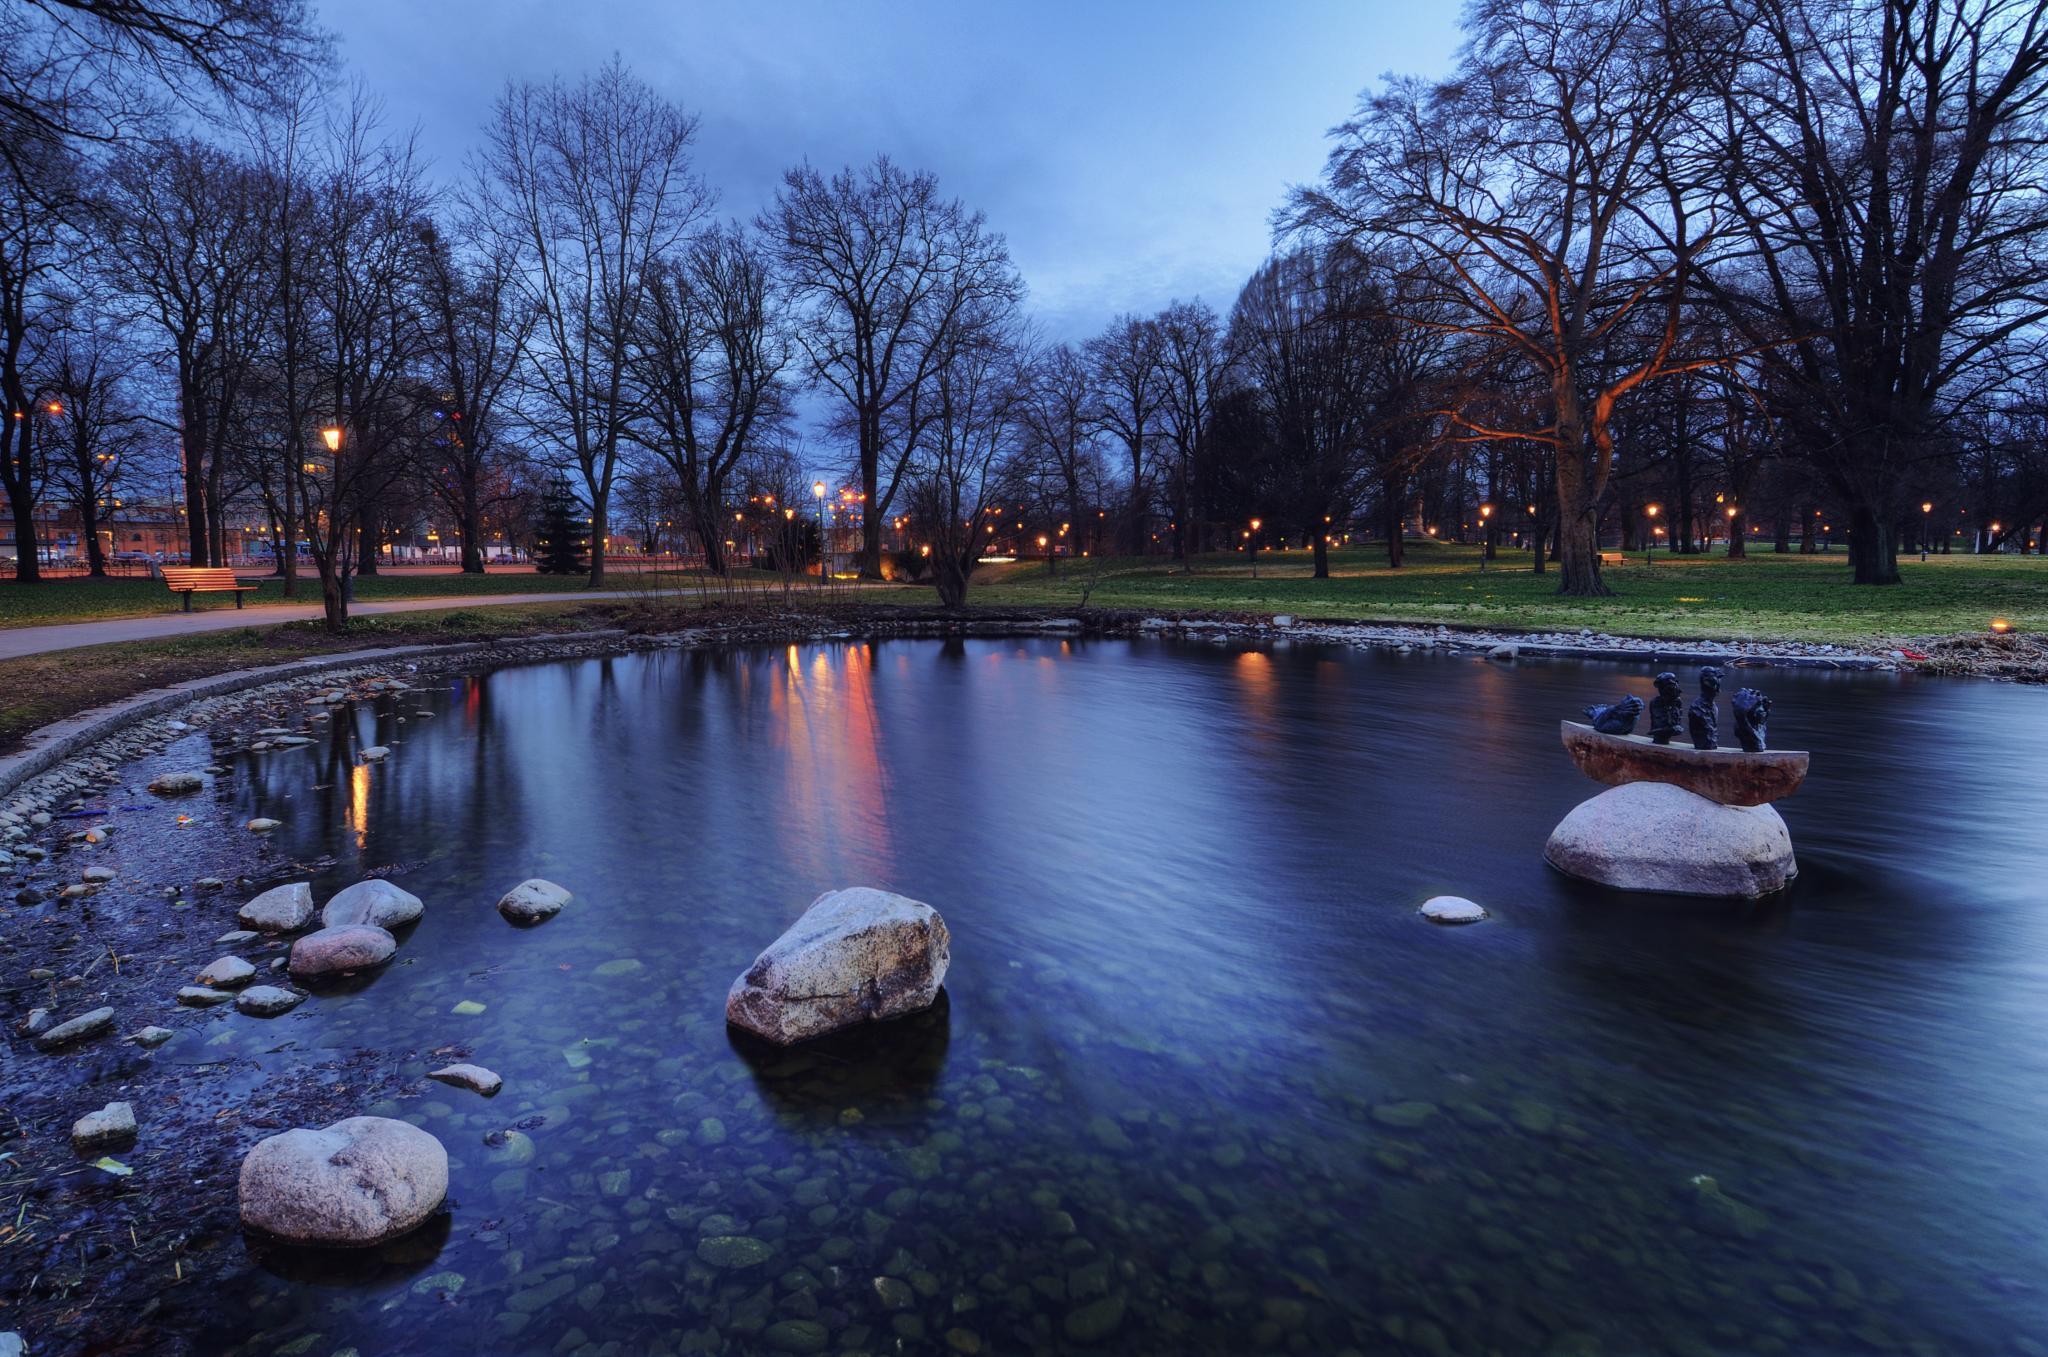 The Vasa Pond by Henrik Sundholm